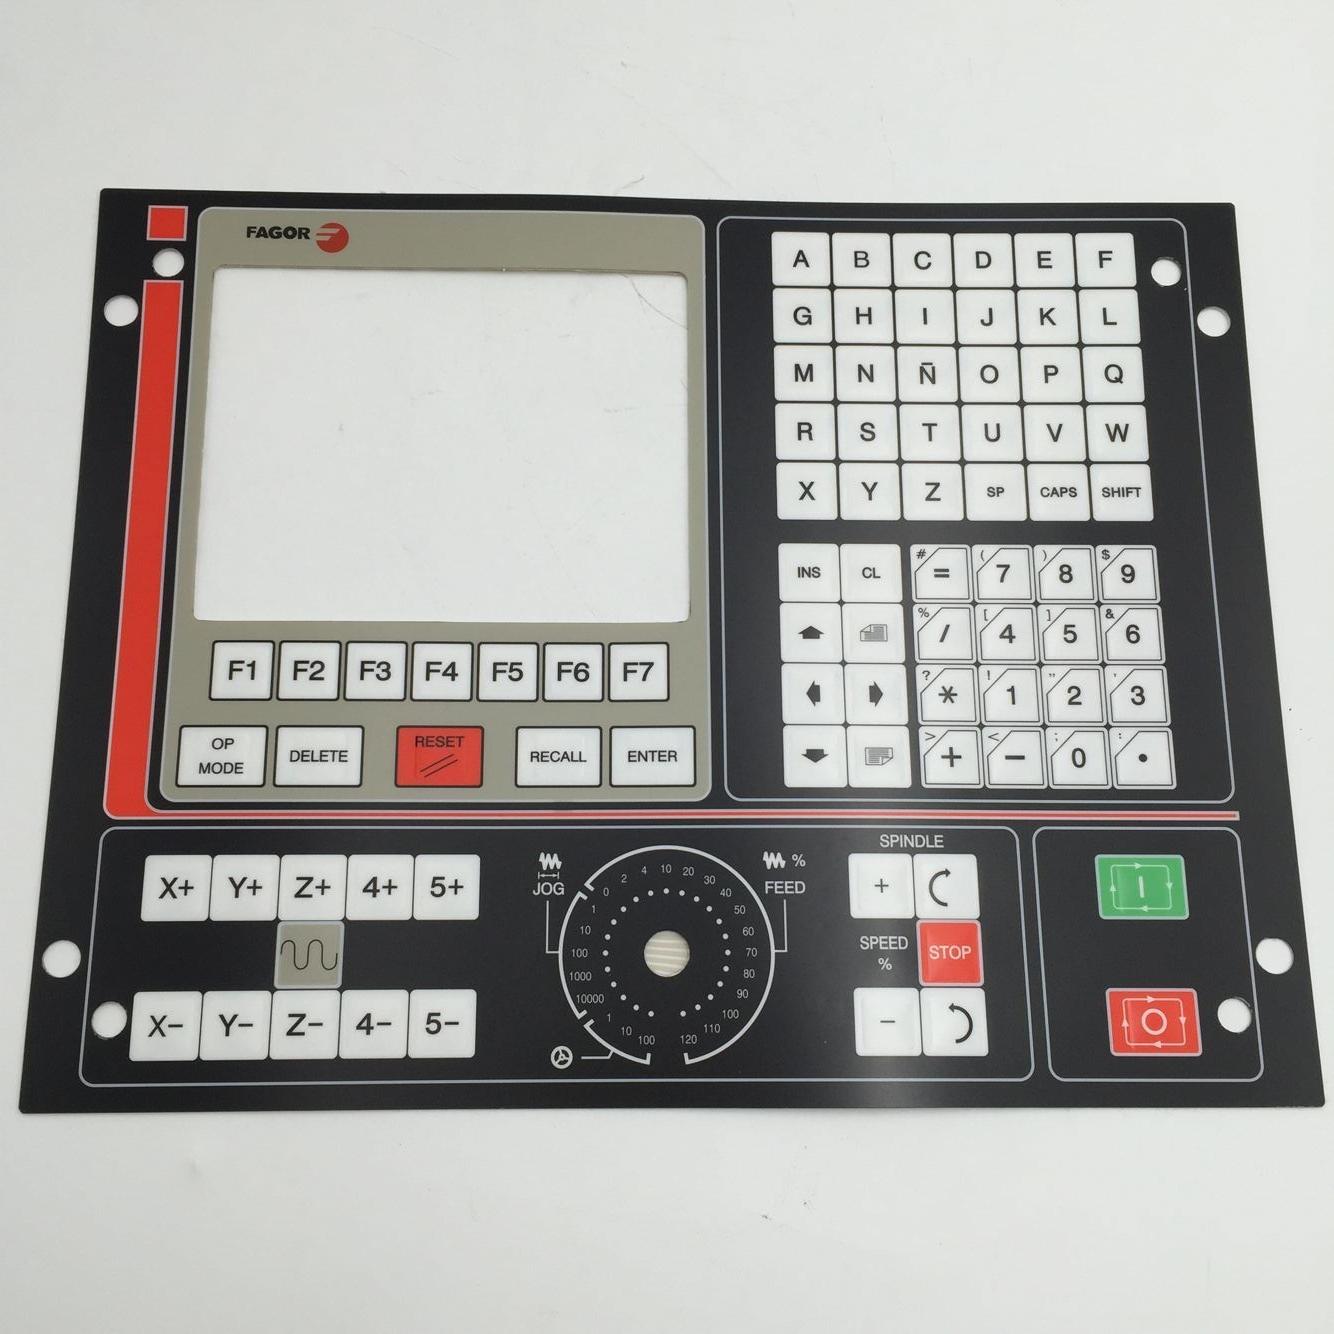 8055M CNC 8050//55-GP FAGOR Key Button Membrane for CNC System 90 days Warranty